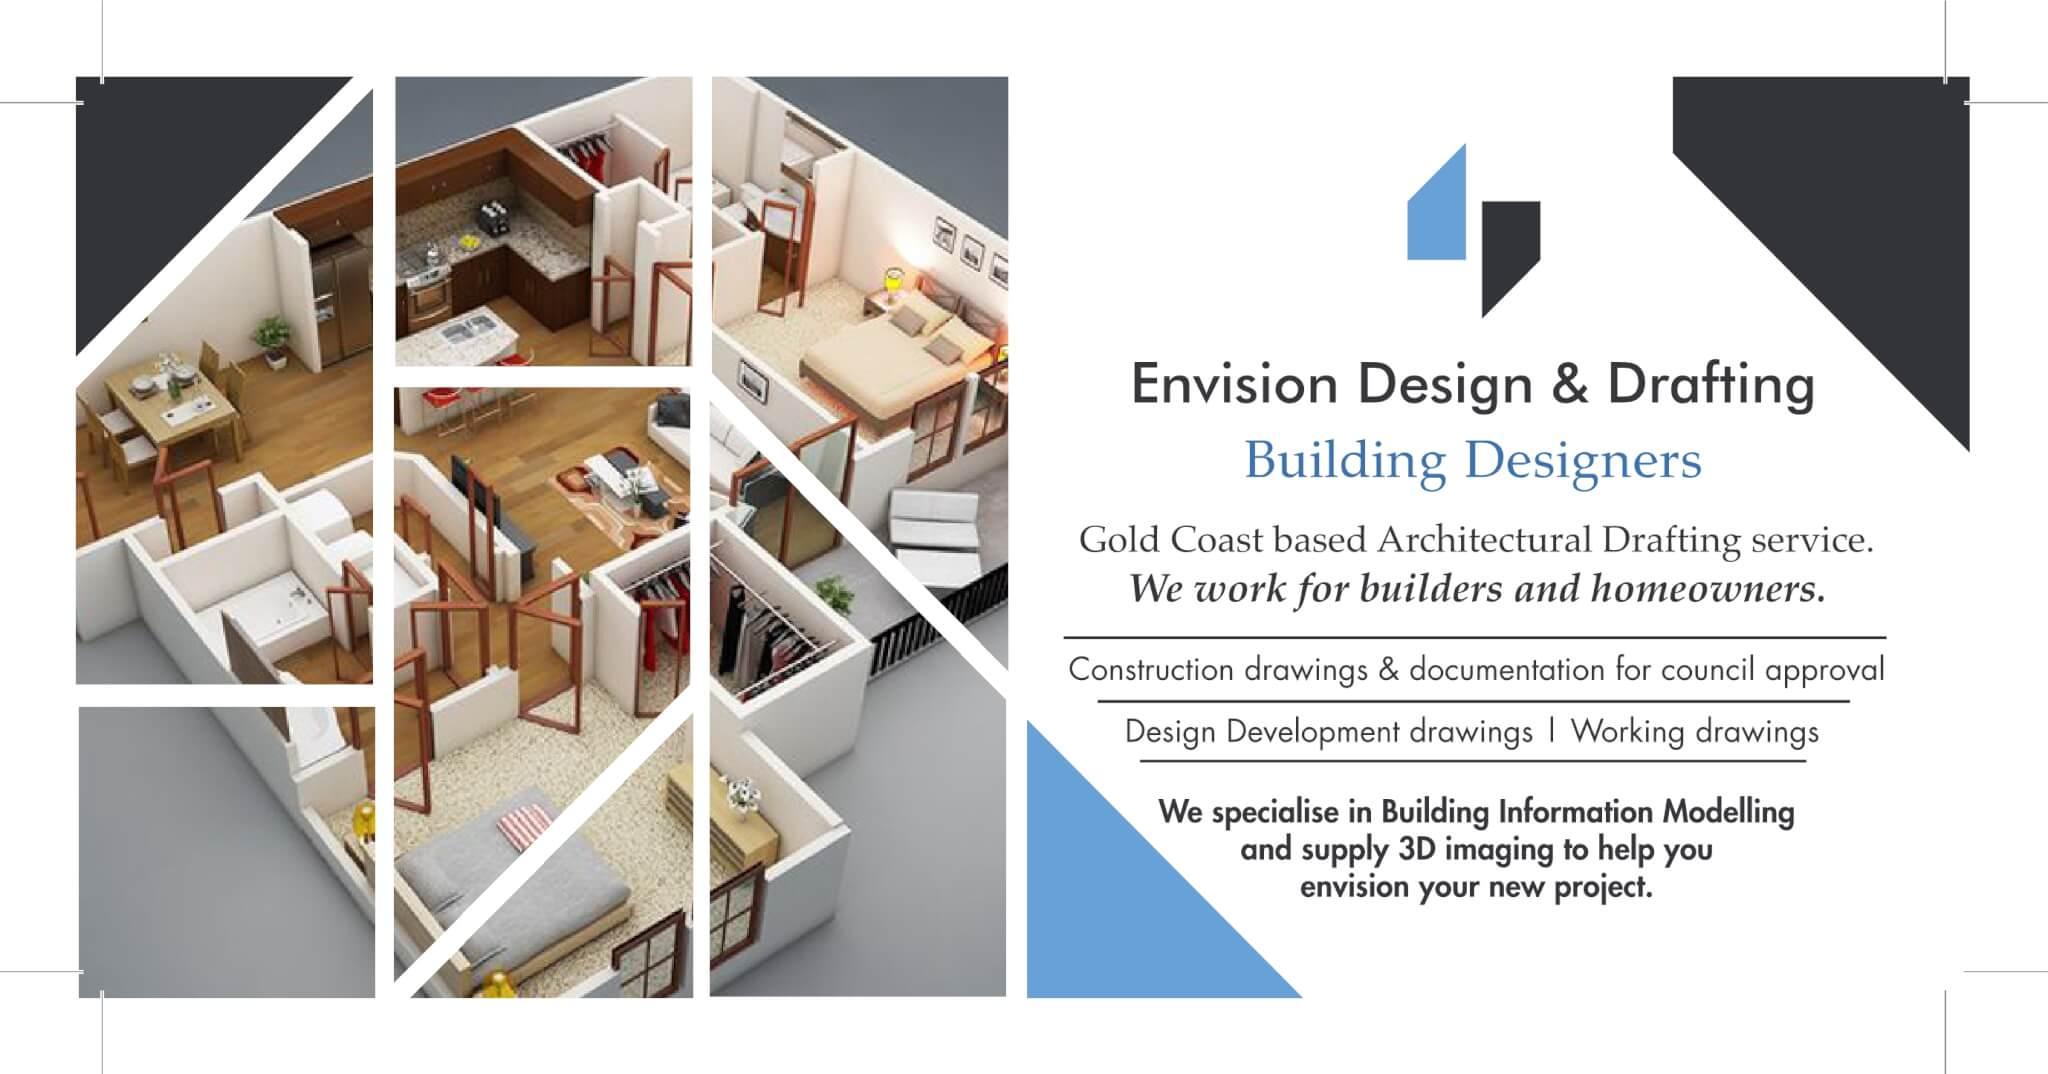 printing, print services gold coast image 1